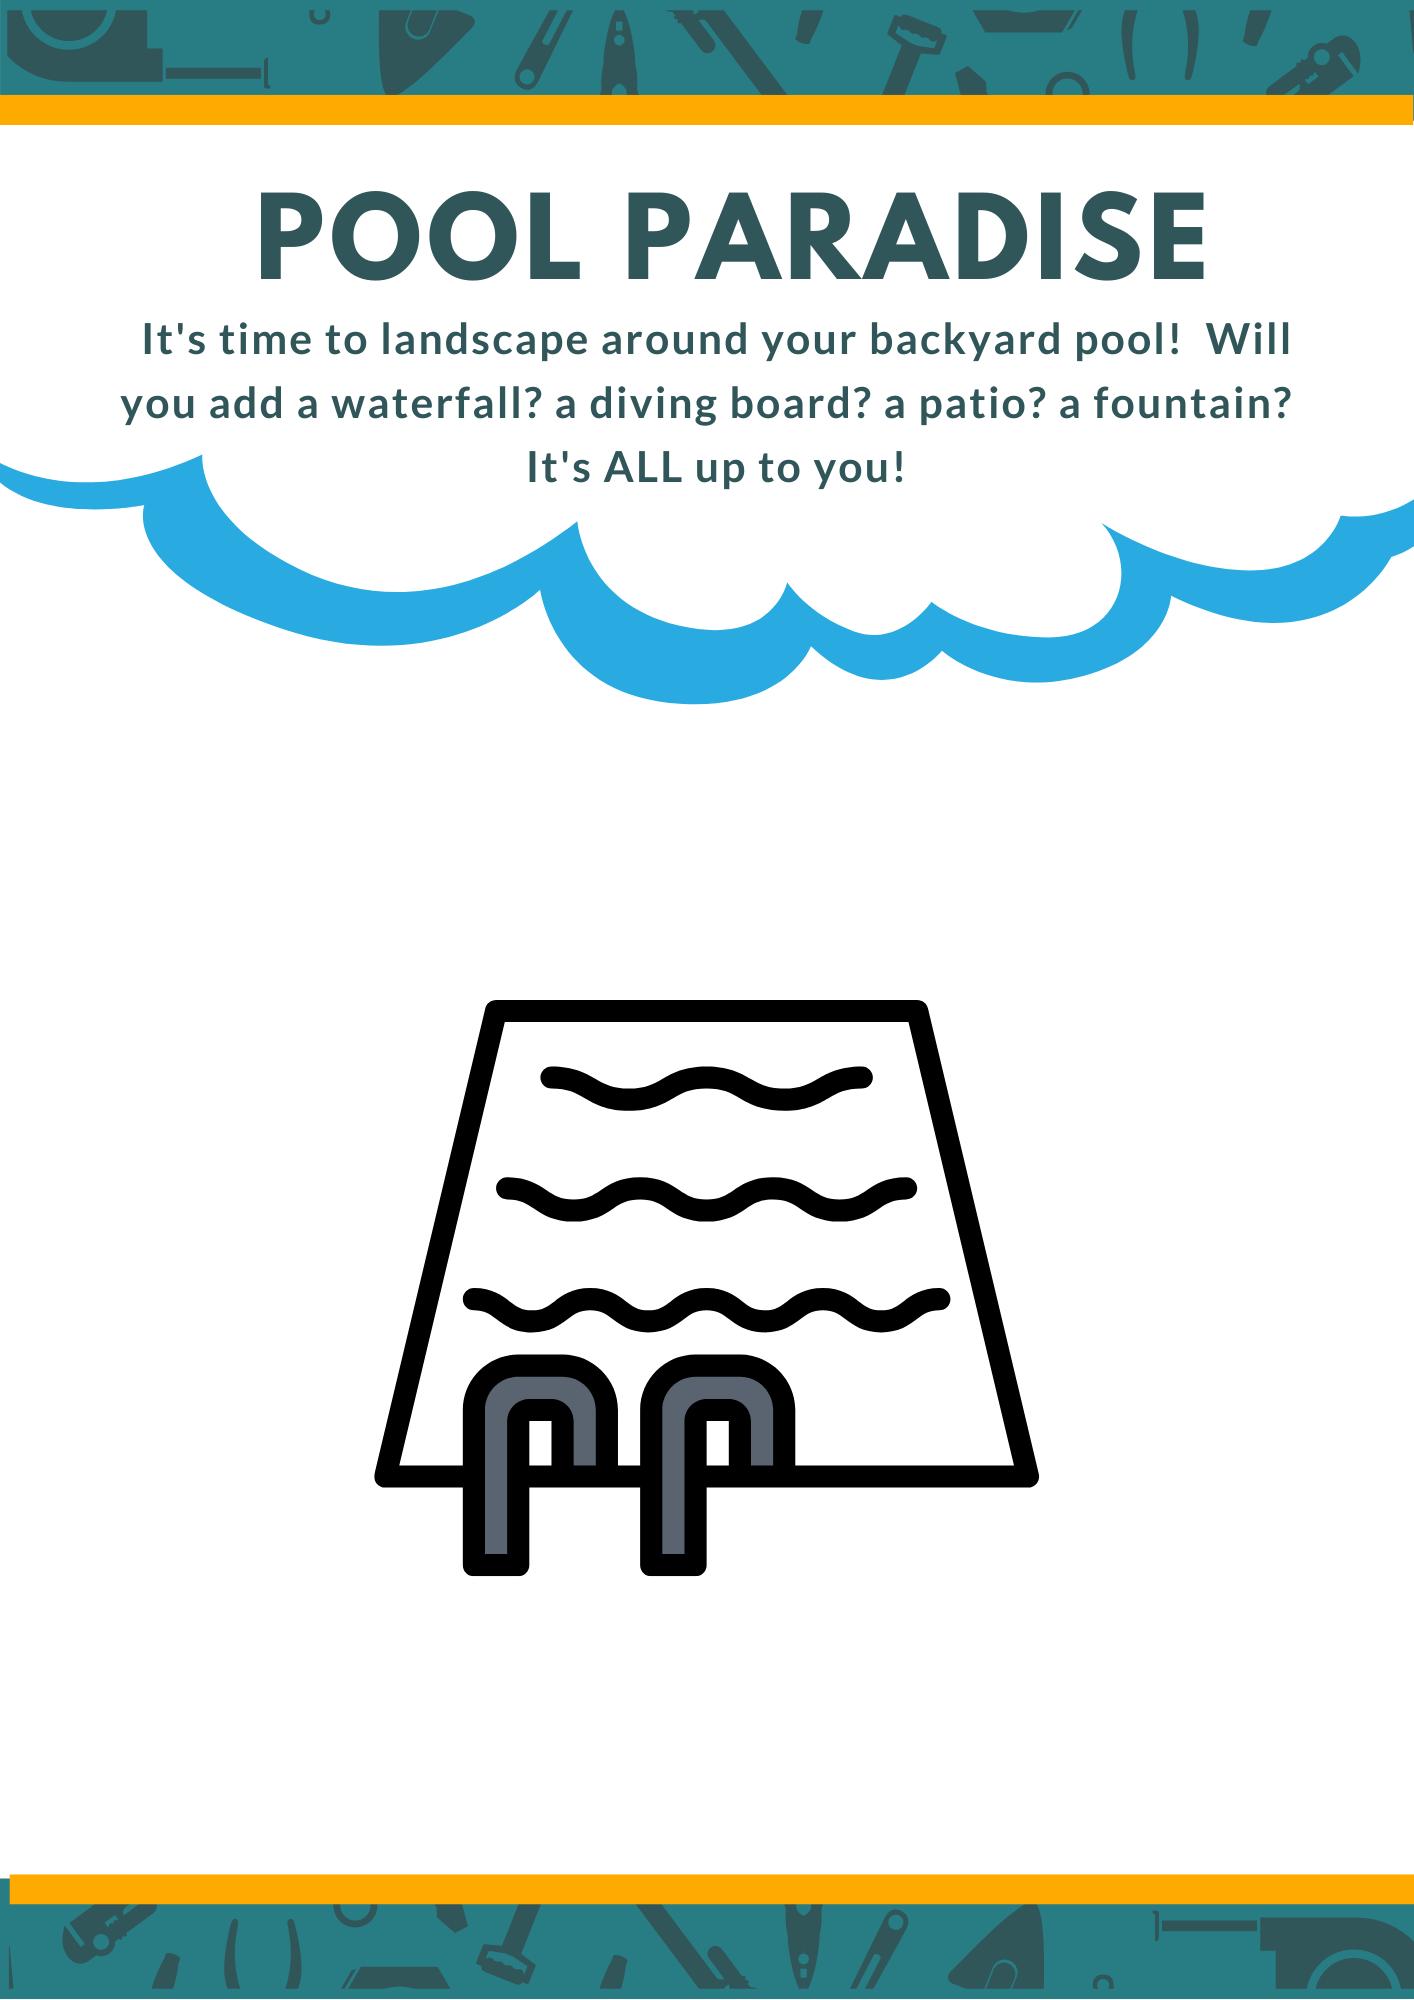 pool-paradise-activity-sheet.png